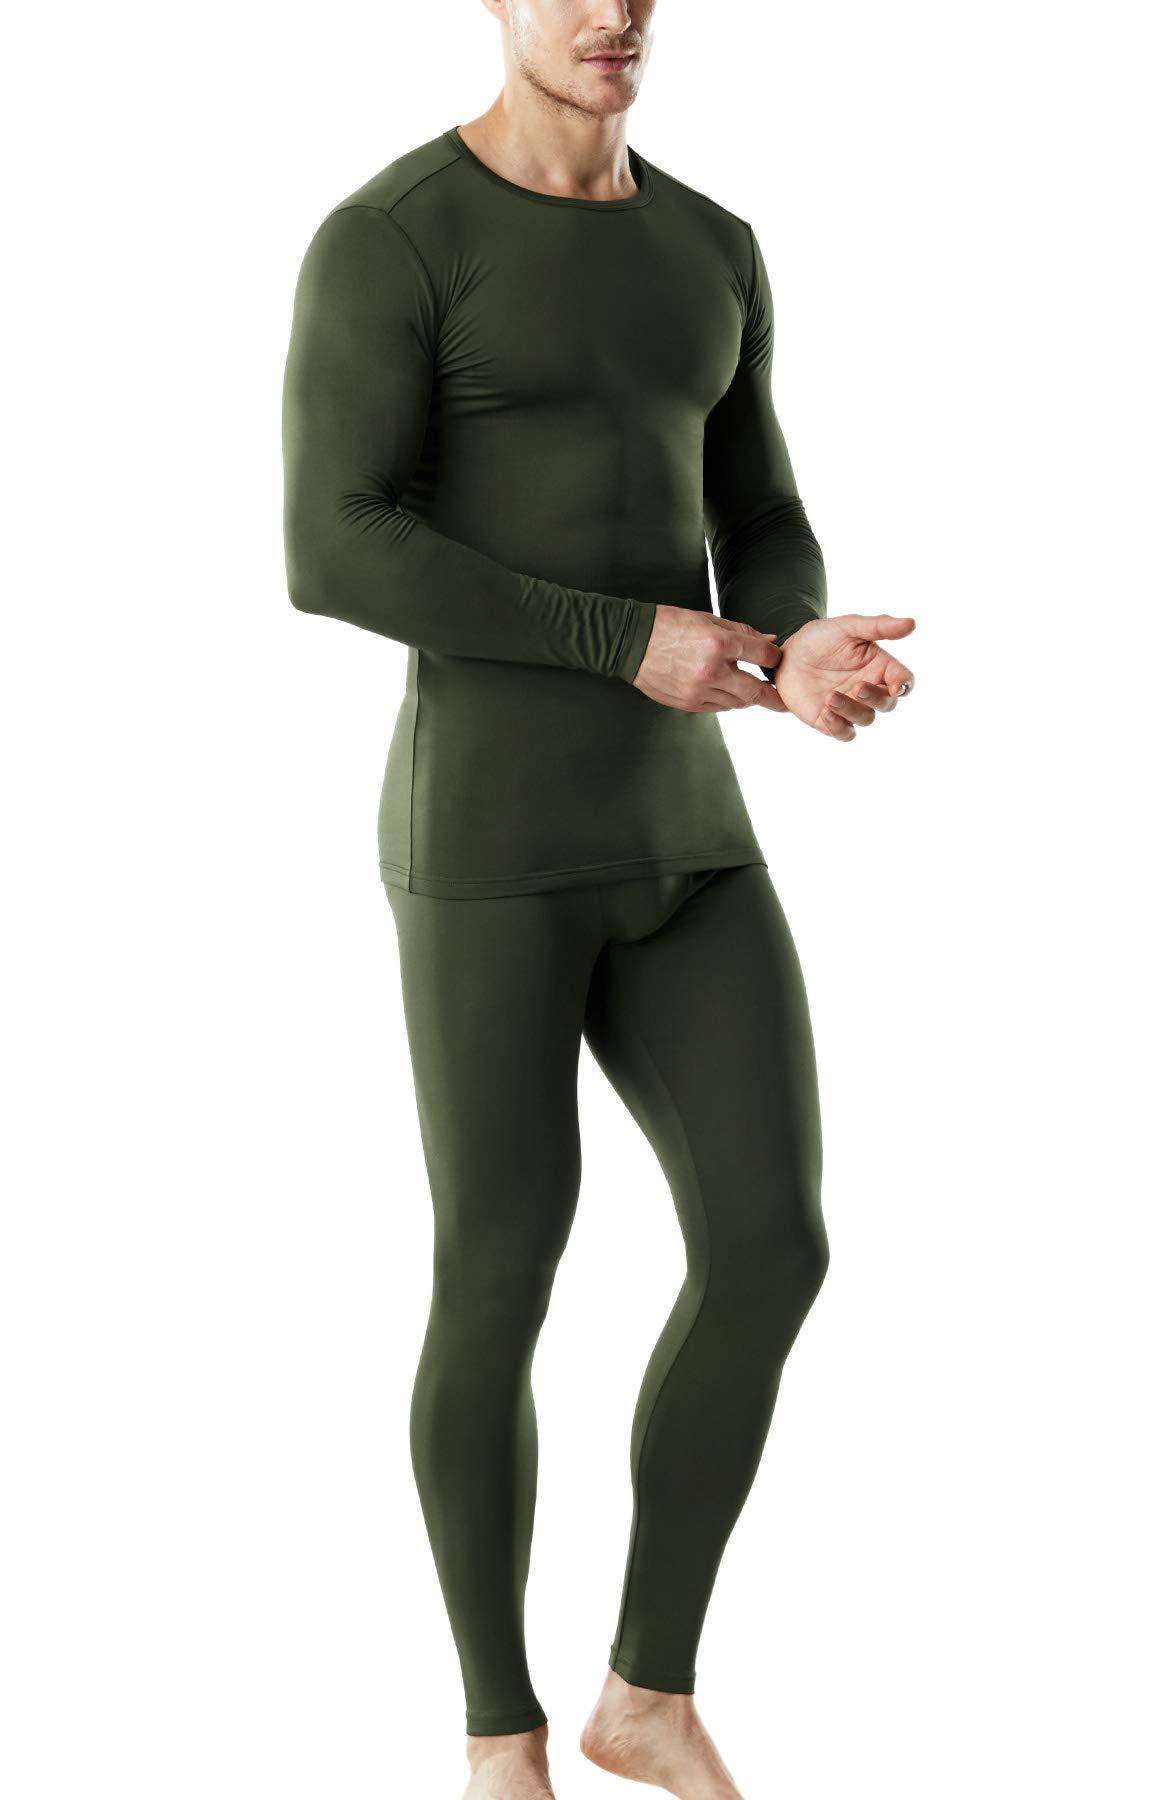 TSLA Blank Men's Microfiber Fleece Lined Top & Bottom Set, Thermal Fleece(mhs100) - Olive, Large by TSLA